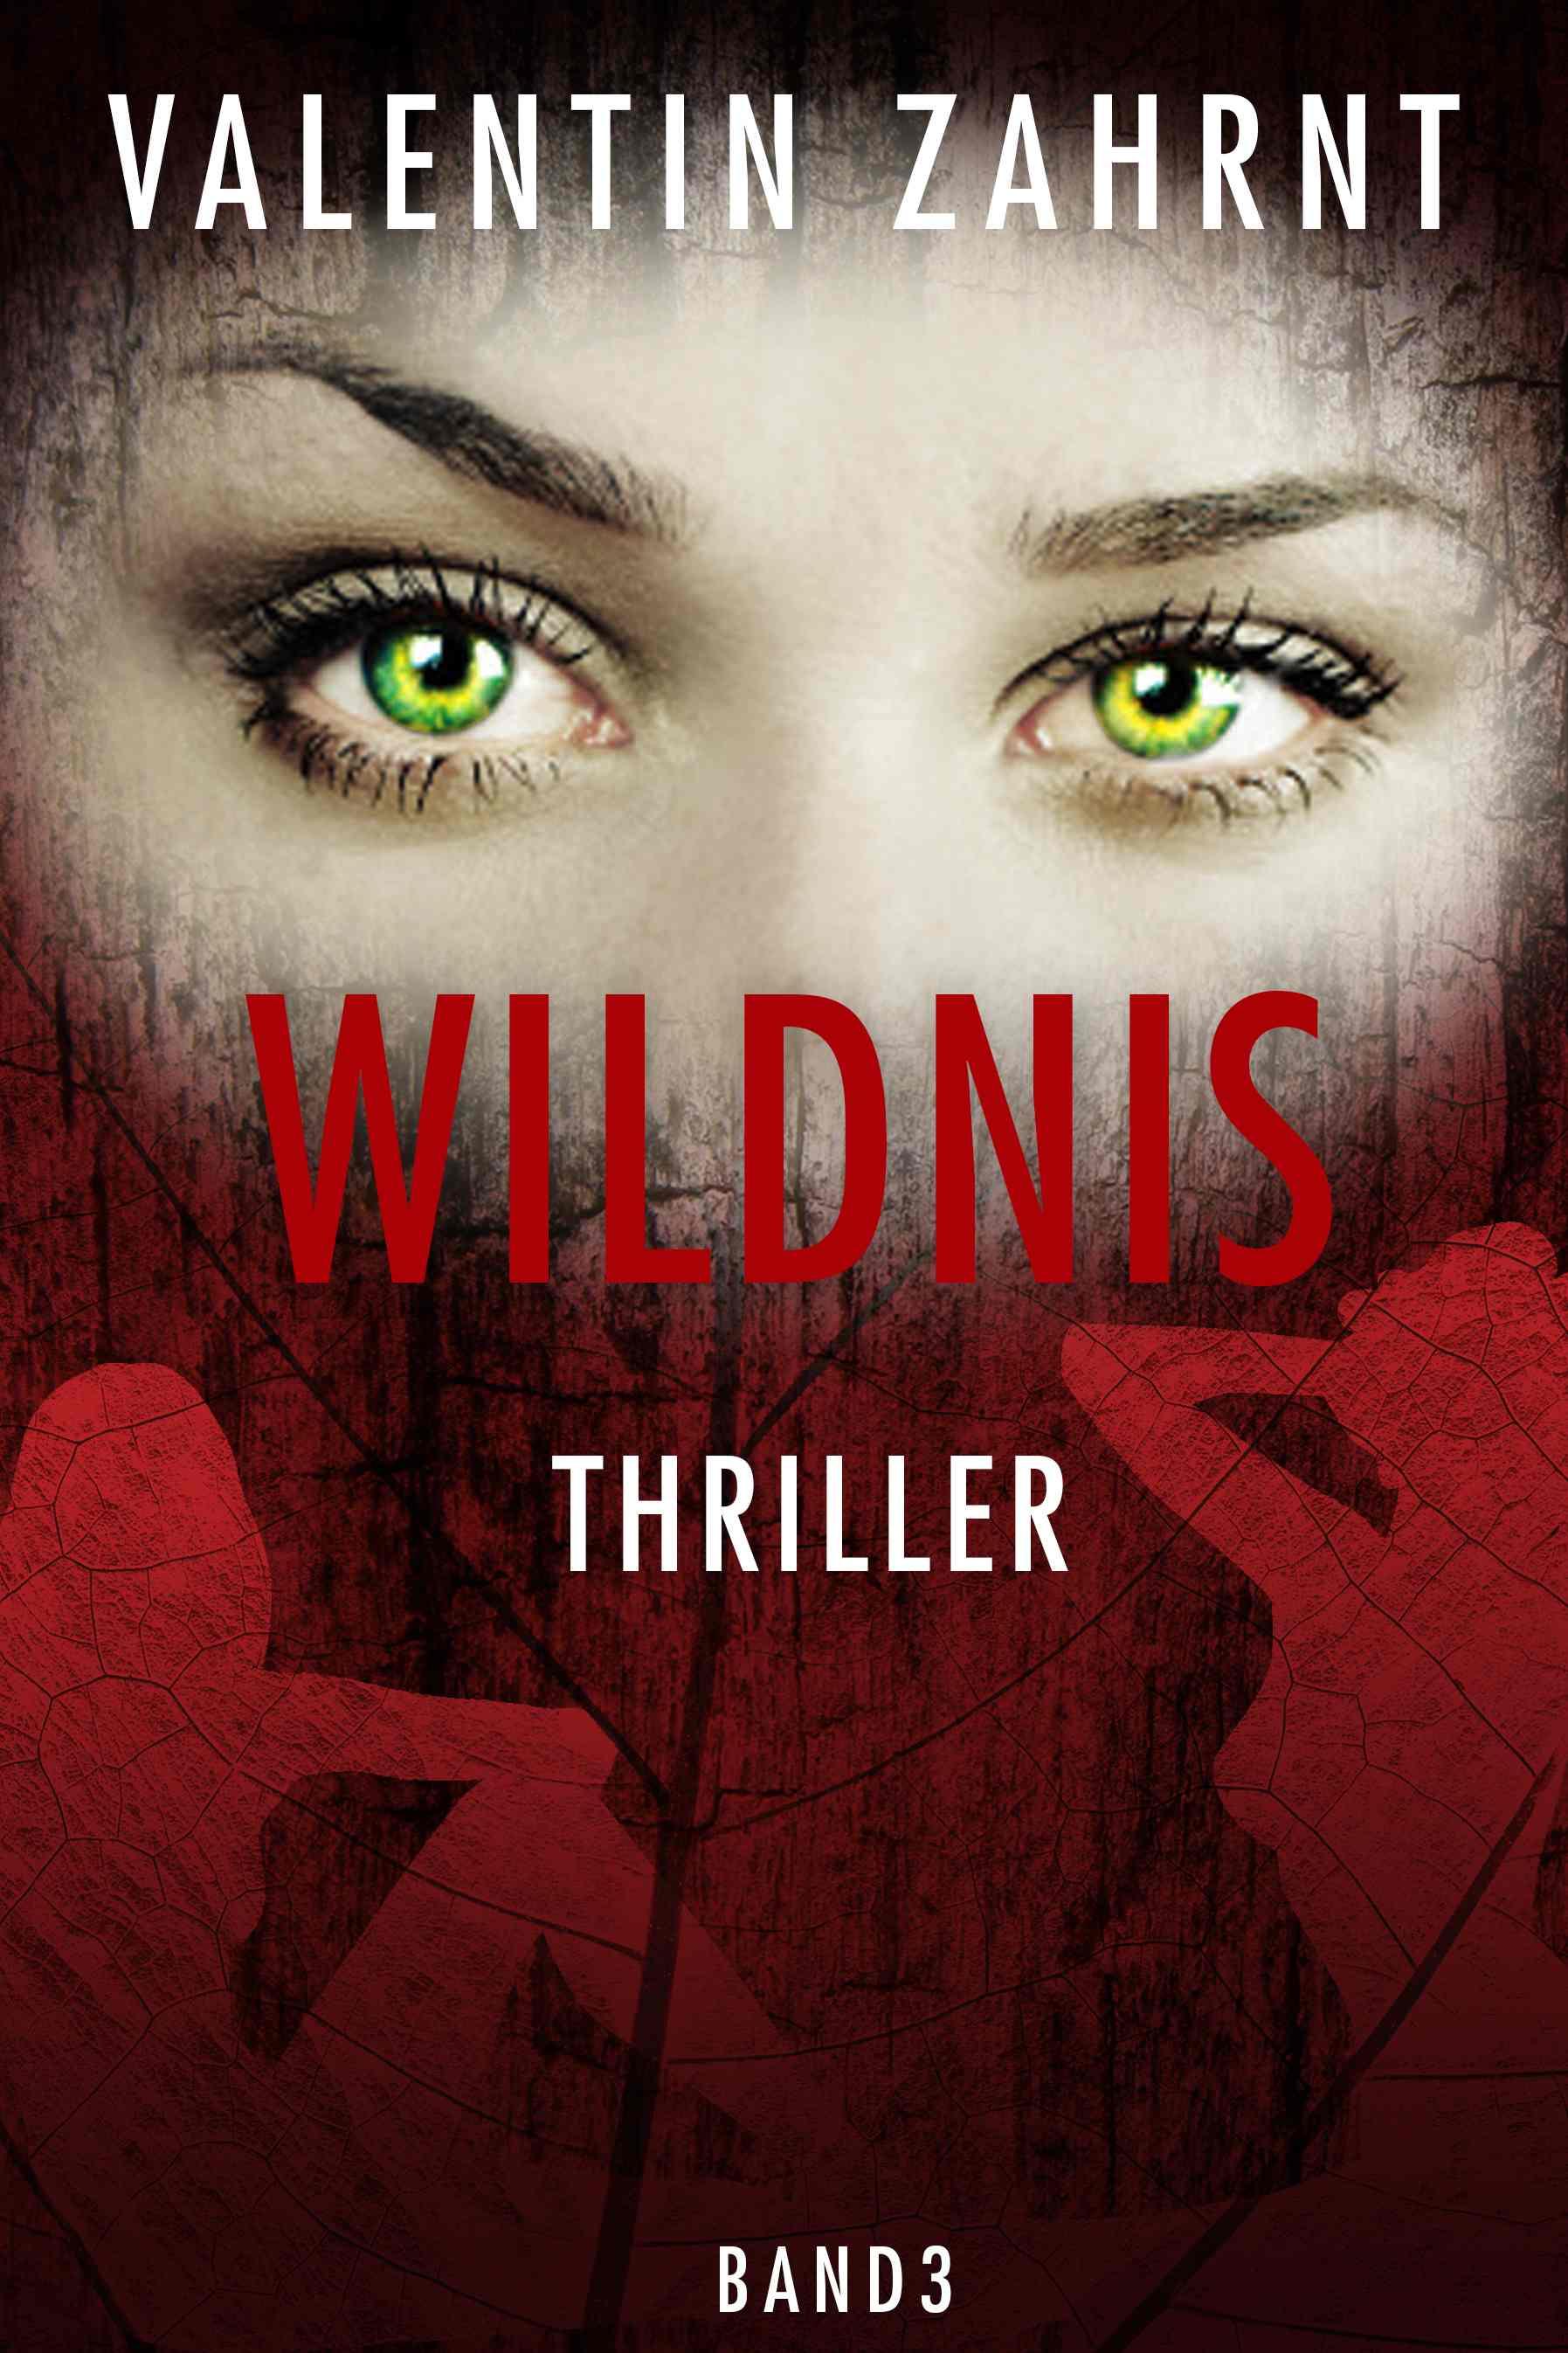 Wildnis 3